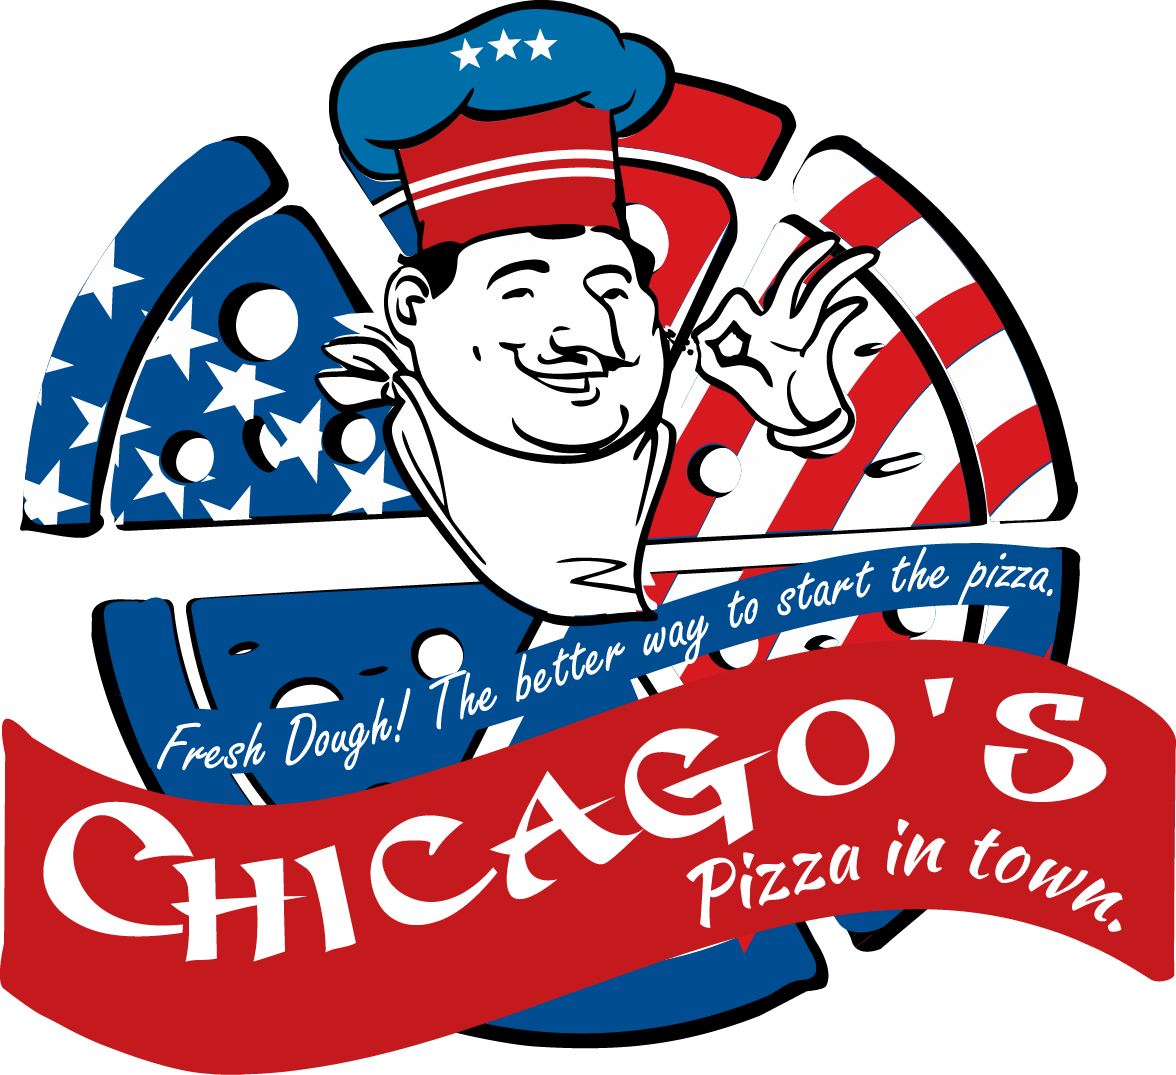 Chicagos Pizza Chicagos Pizza South Croydon South